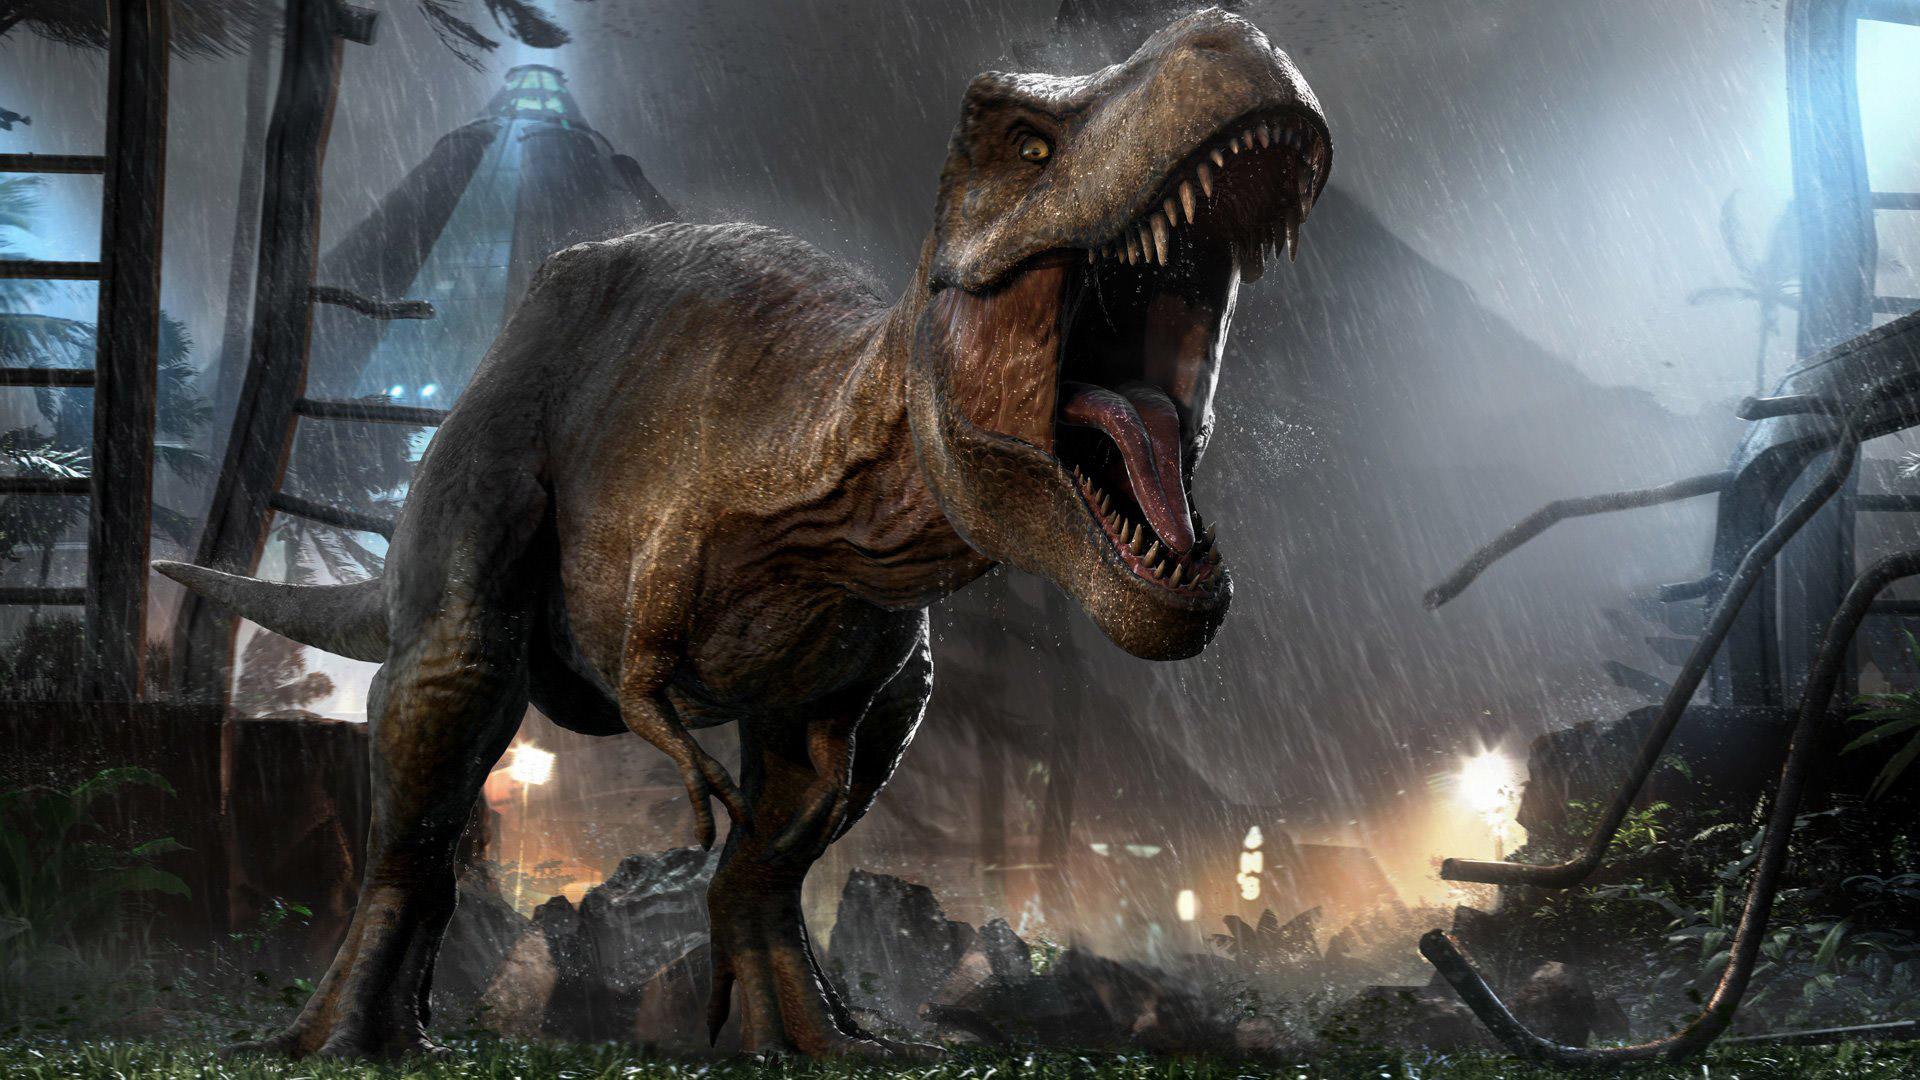 Jurassic World Evolution Wallpaper in 1920x1080